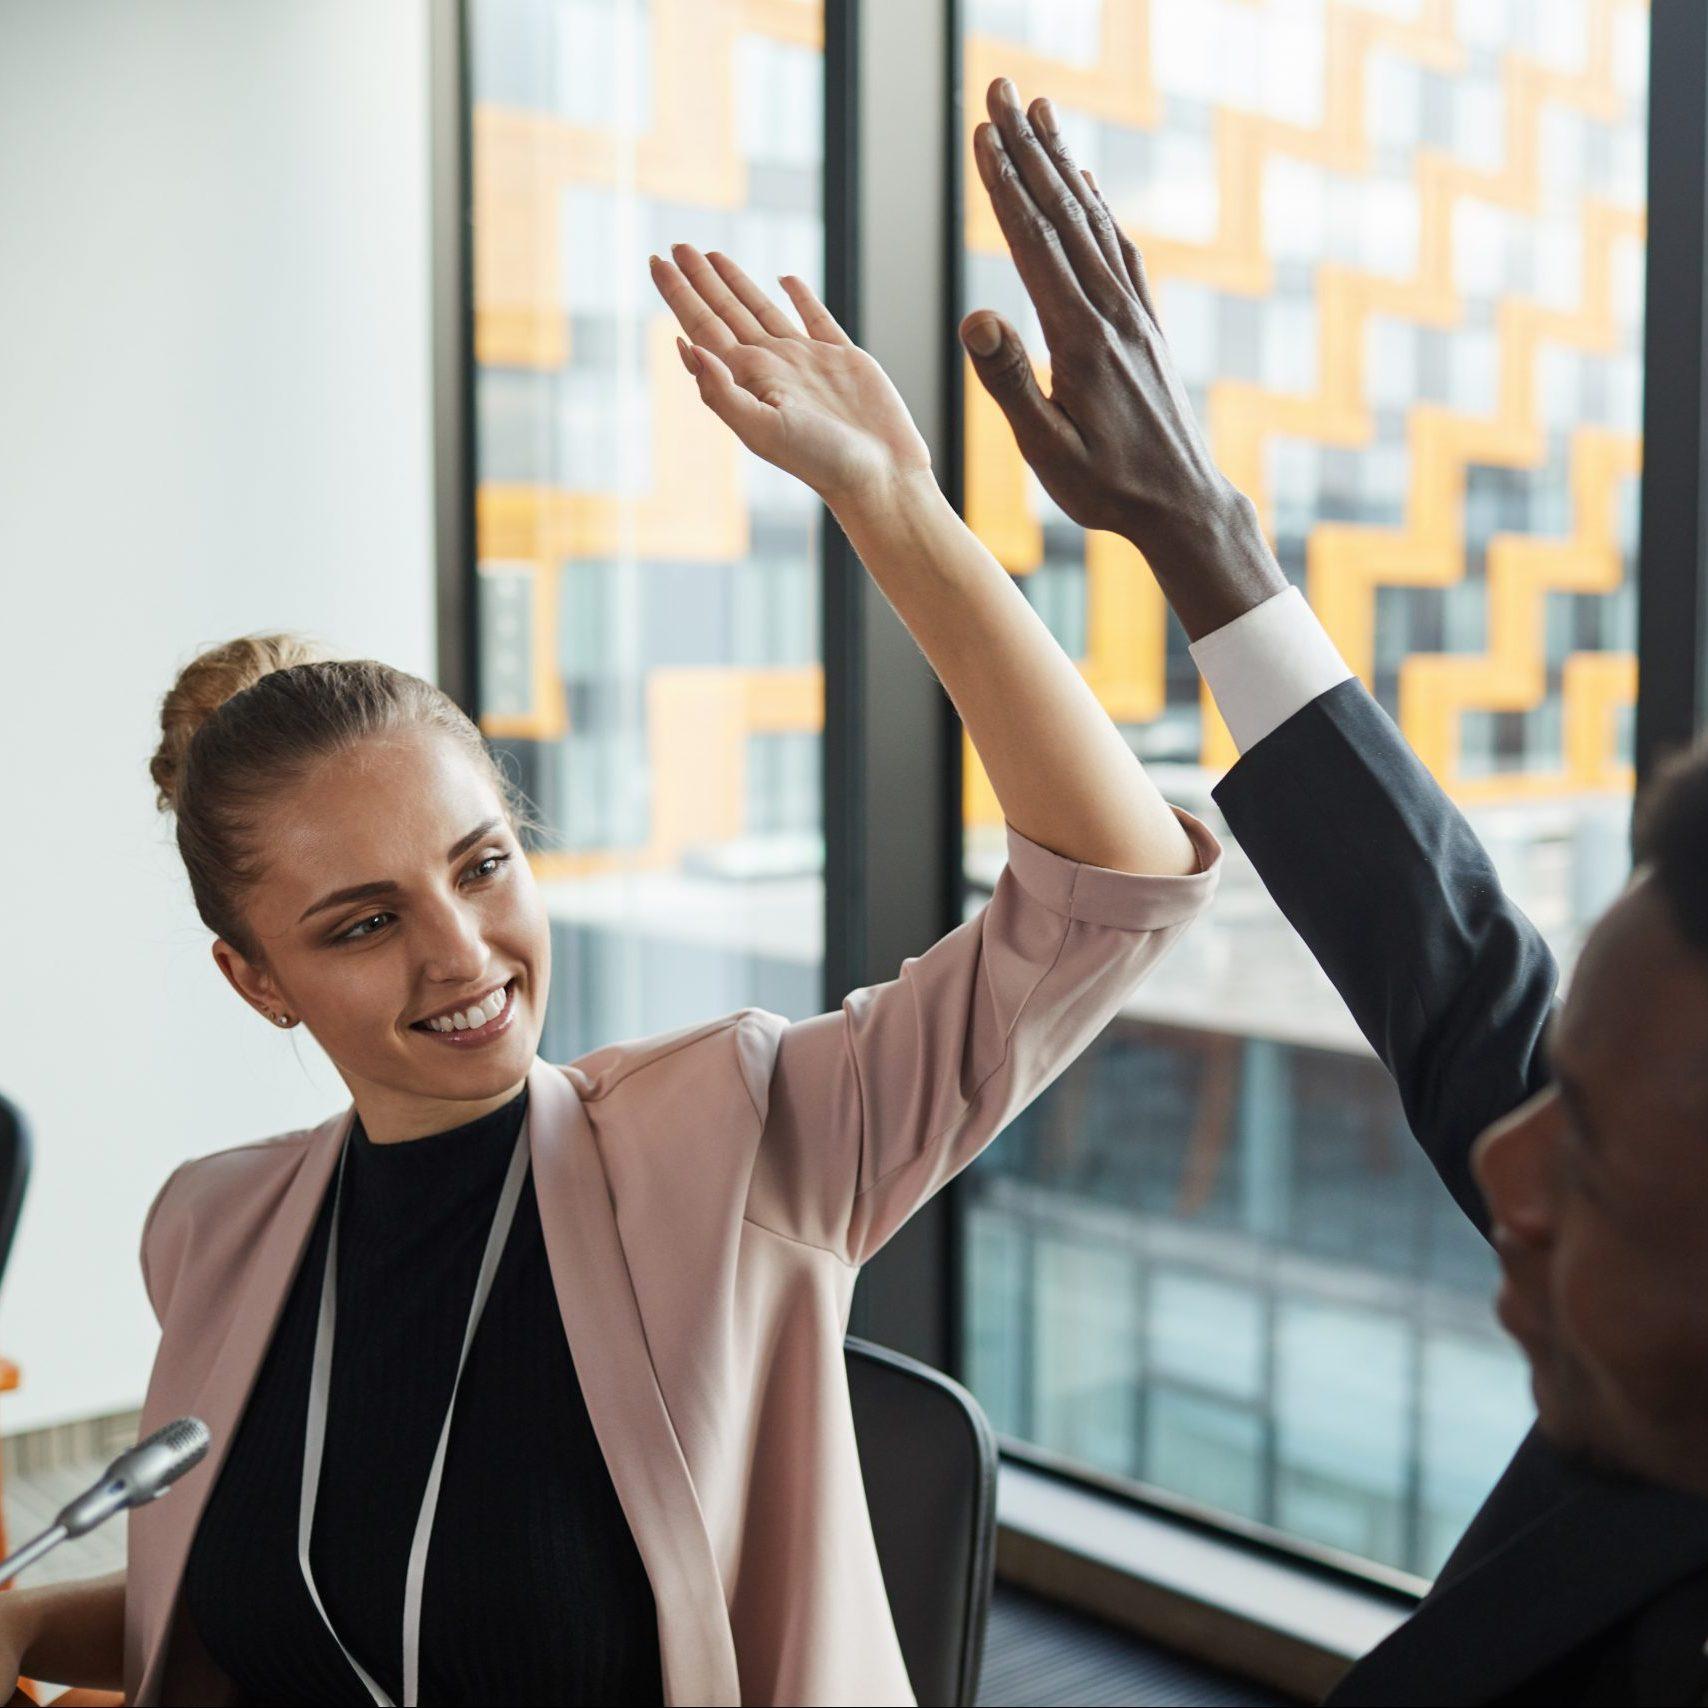 Success in business reaching goals